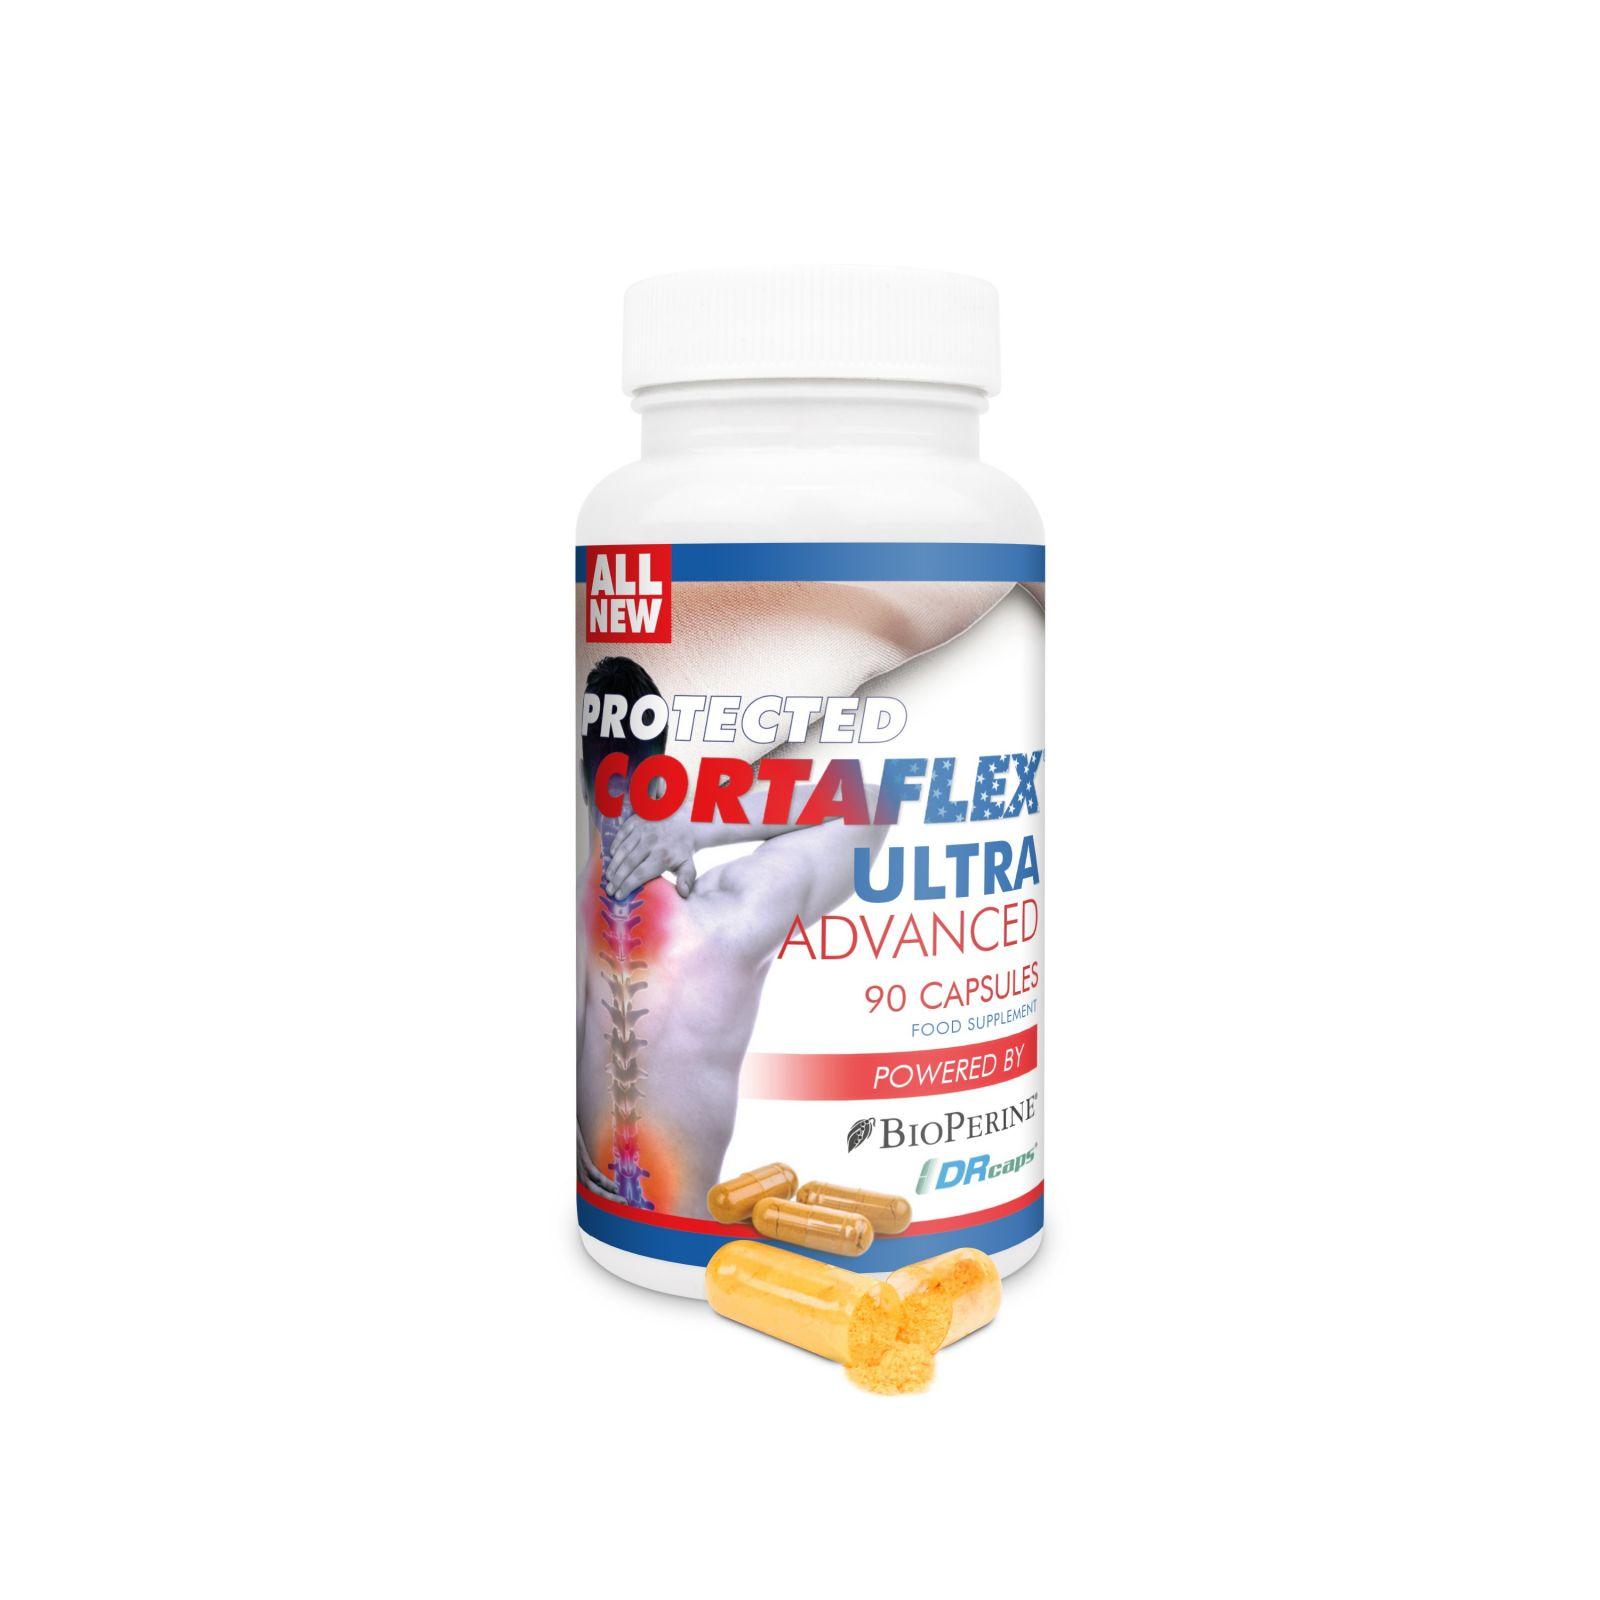 Protected Cortaflex Ultra Advanced